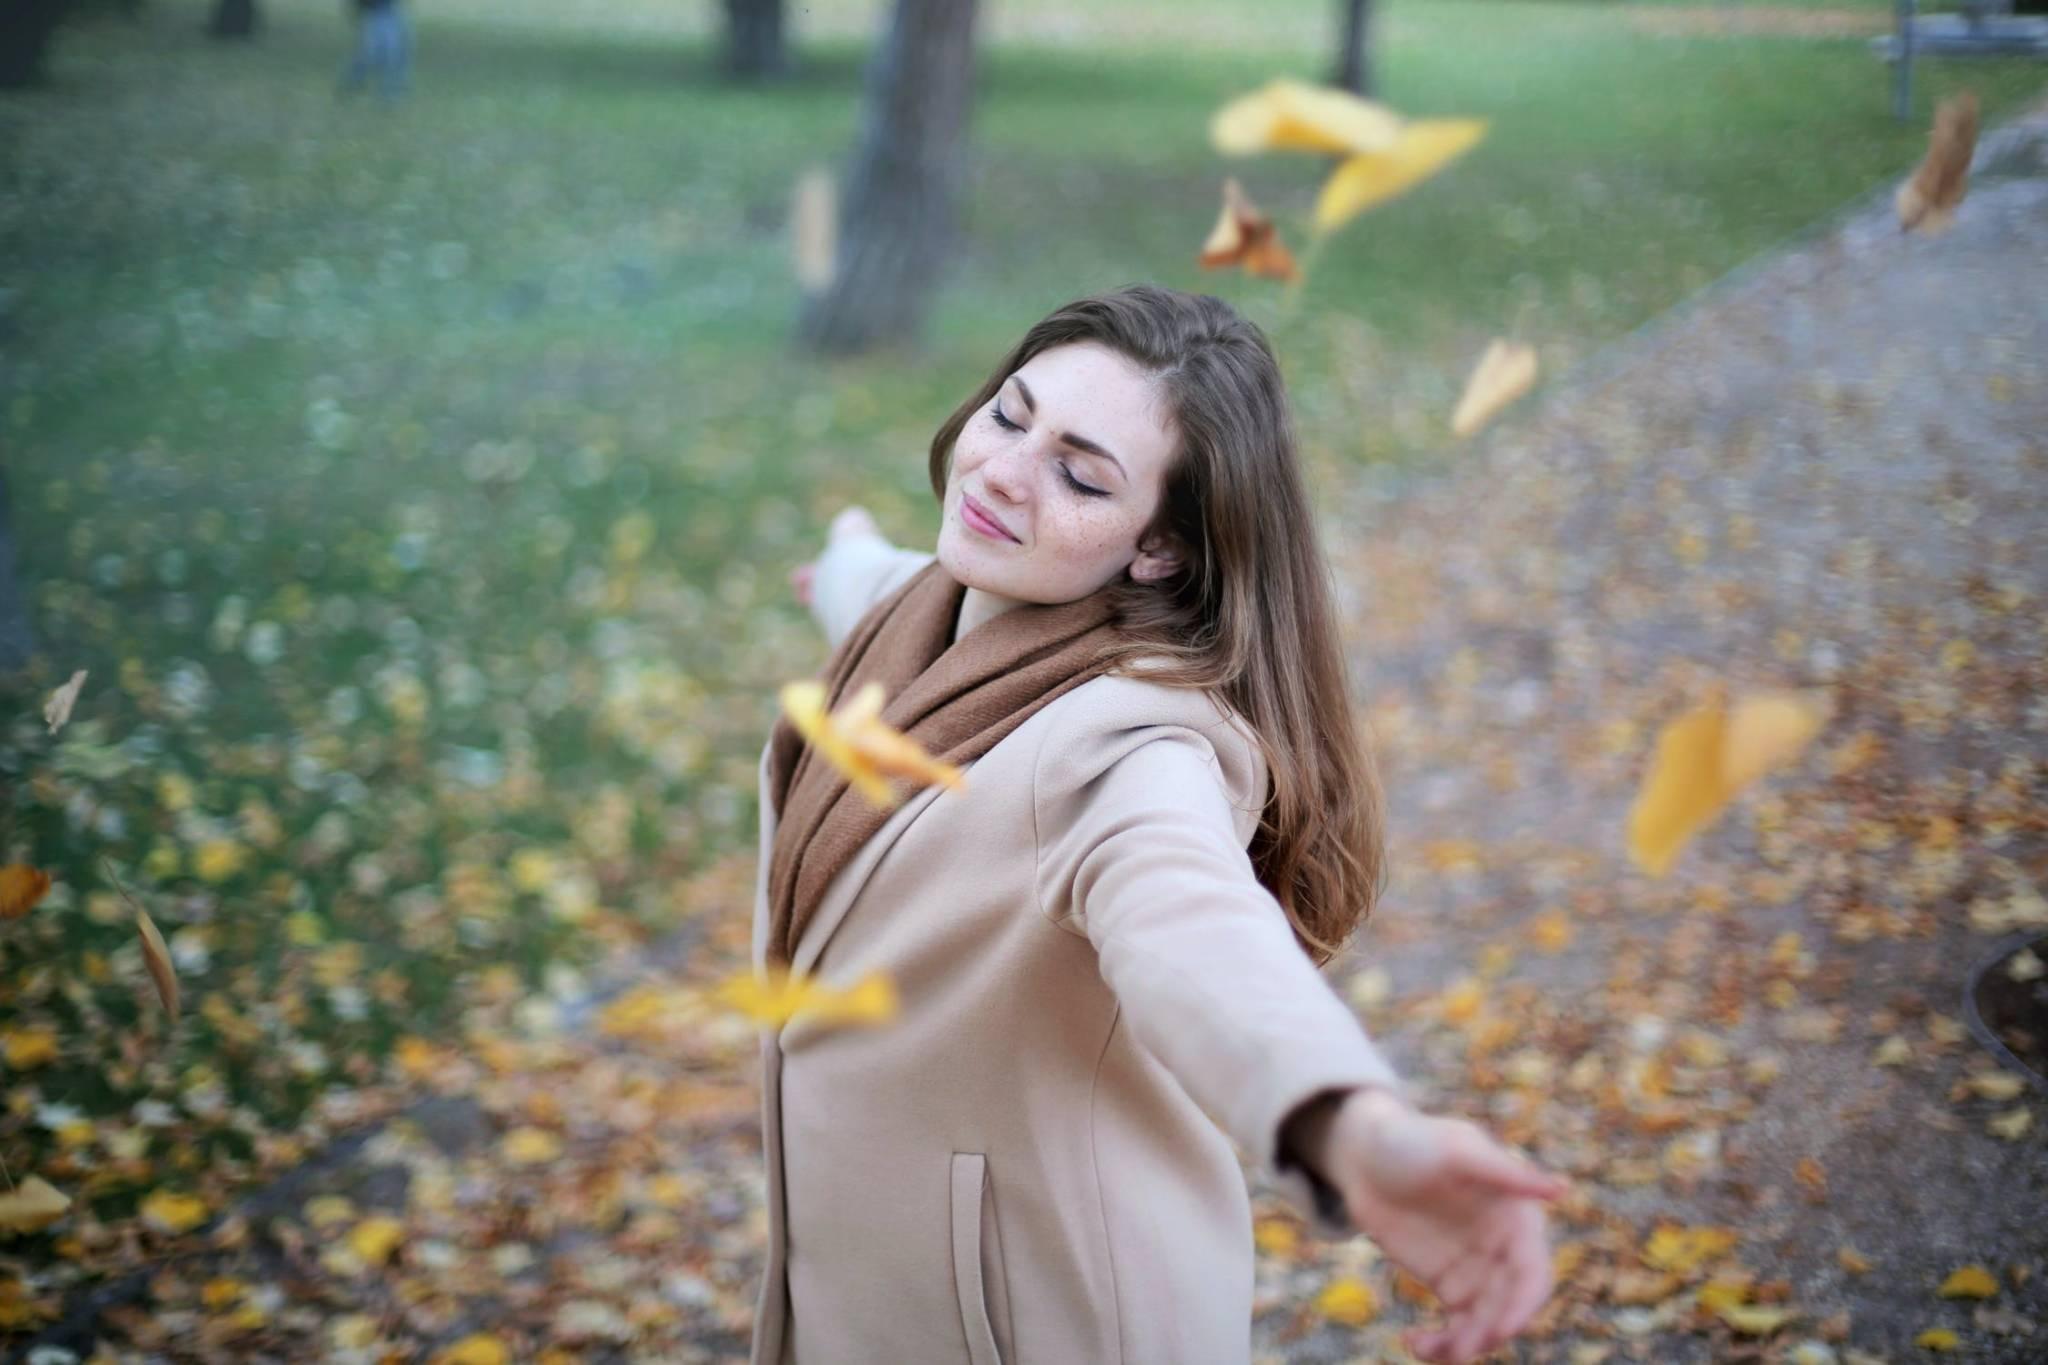 Come controllare i pensieri negativi